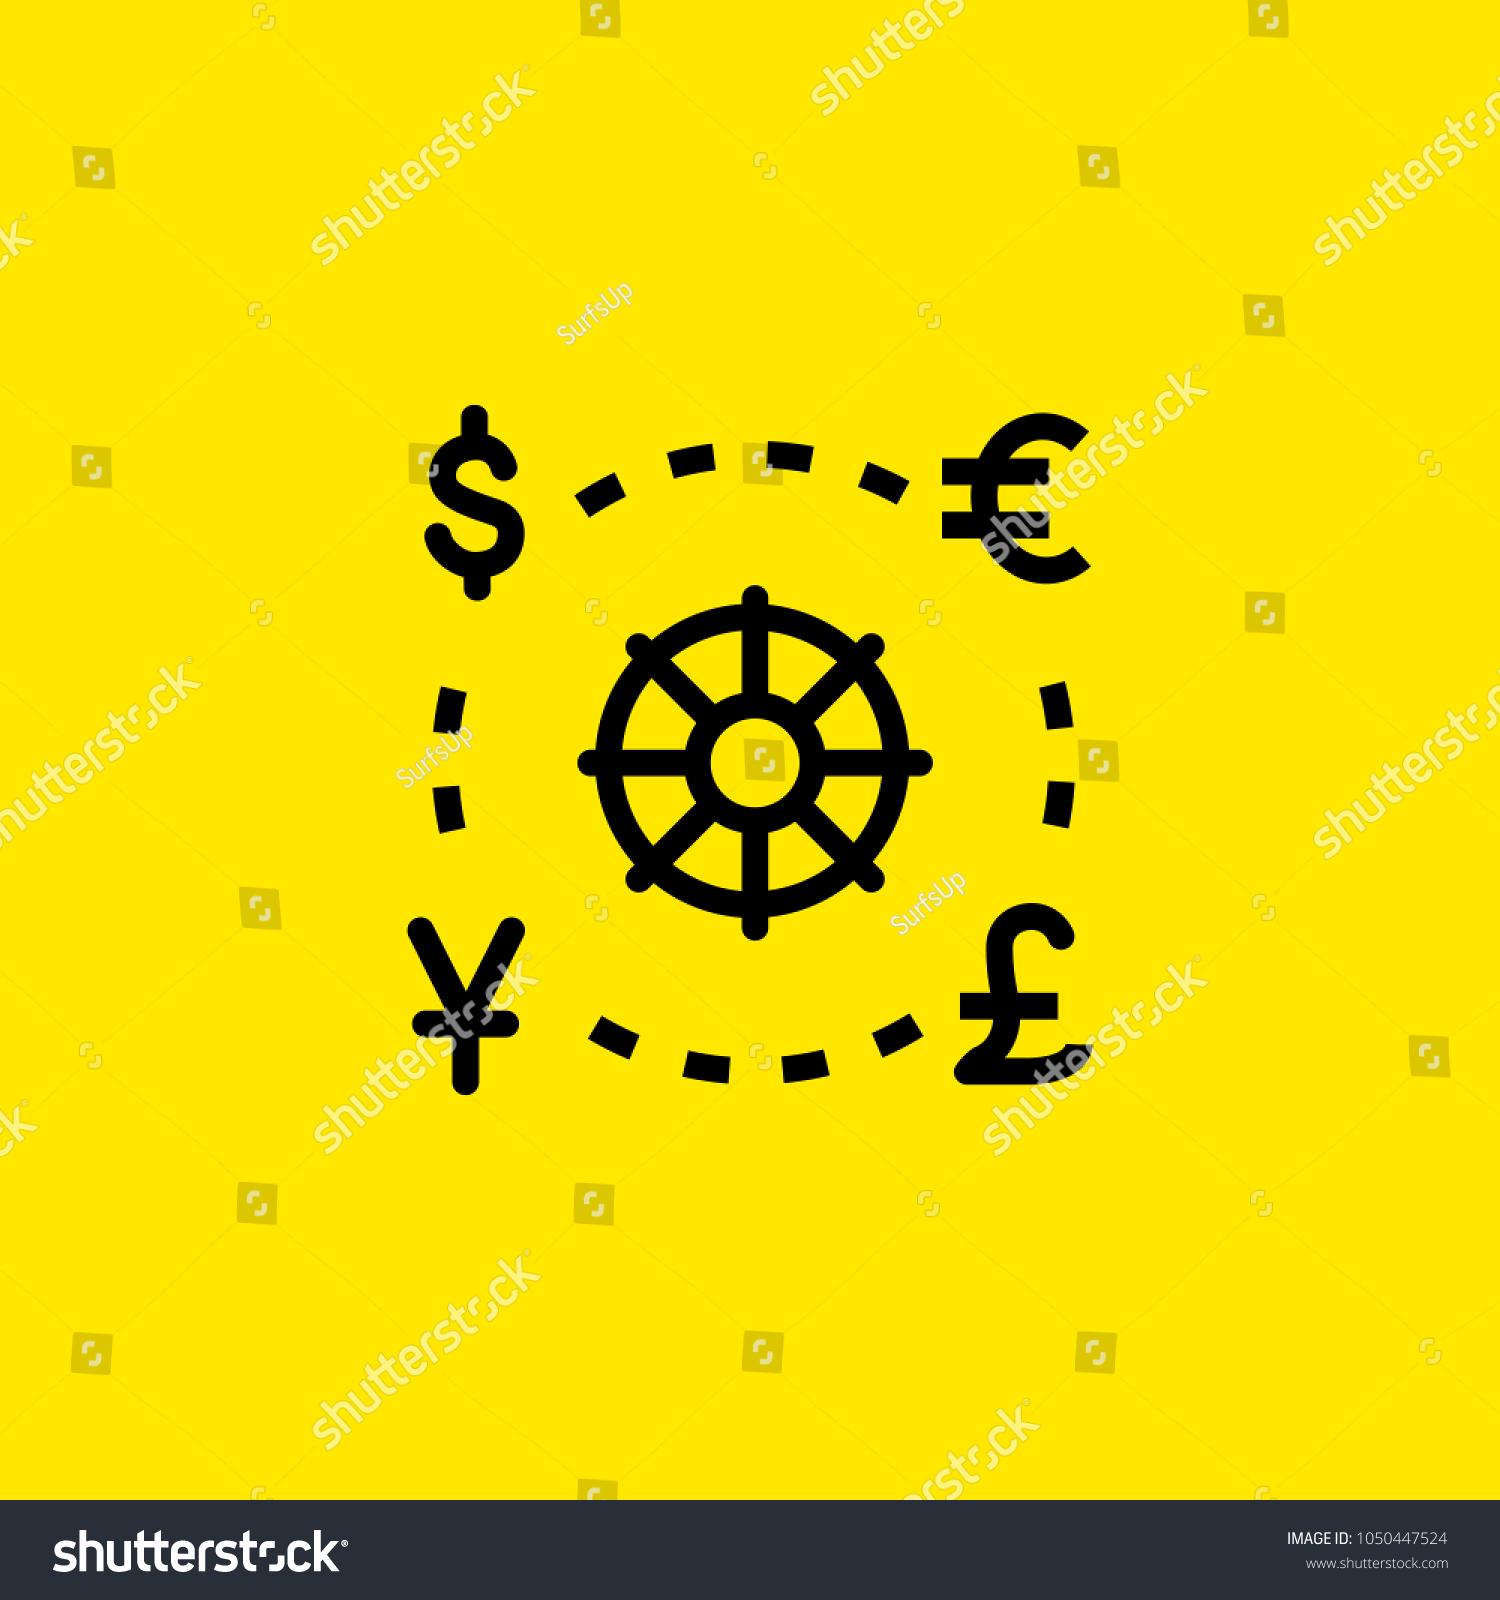 Icon world currencies money finance symbols stock vector 1050447524 icon of world currencies money finance symbols exchange concept can be buycottarizona Gallery